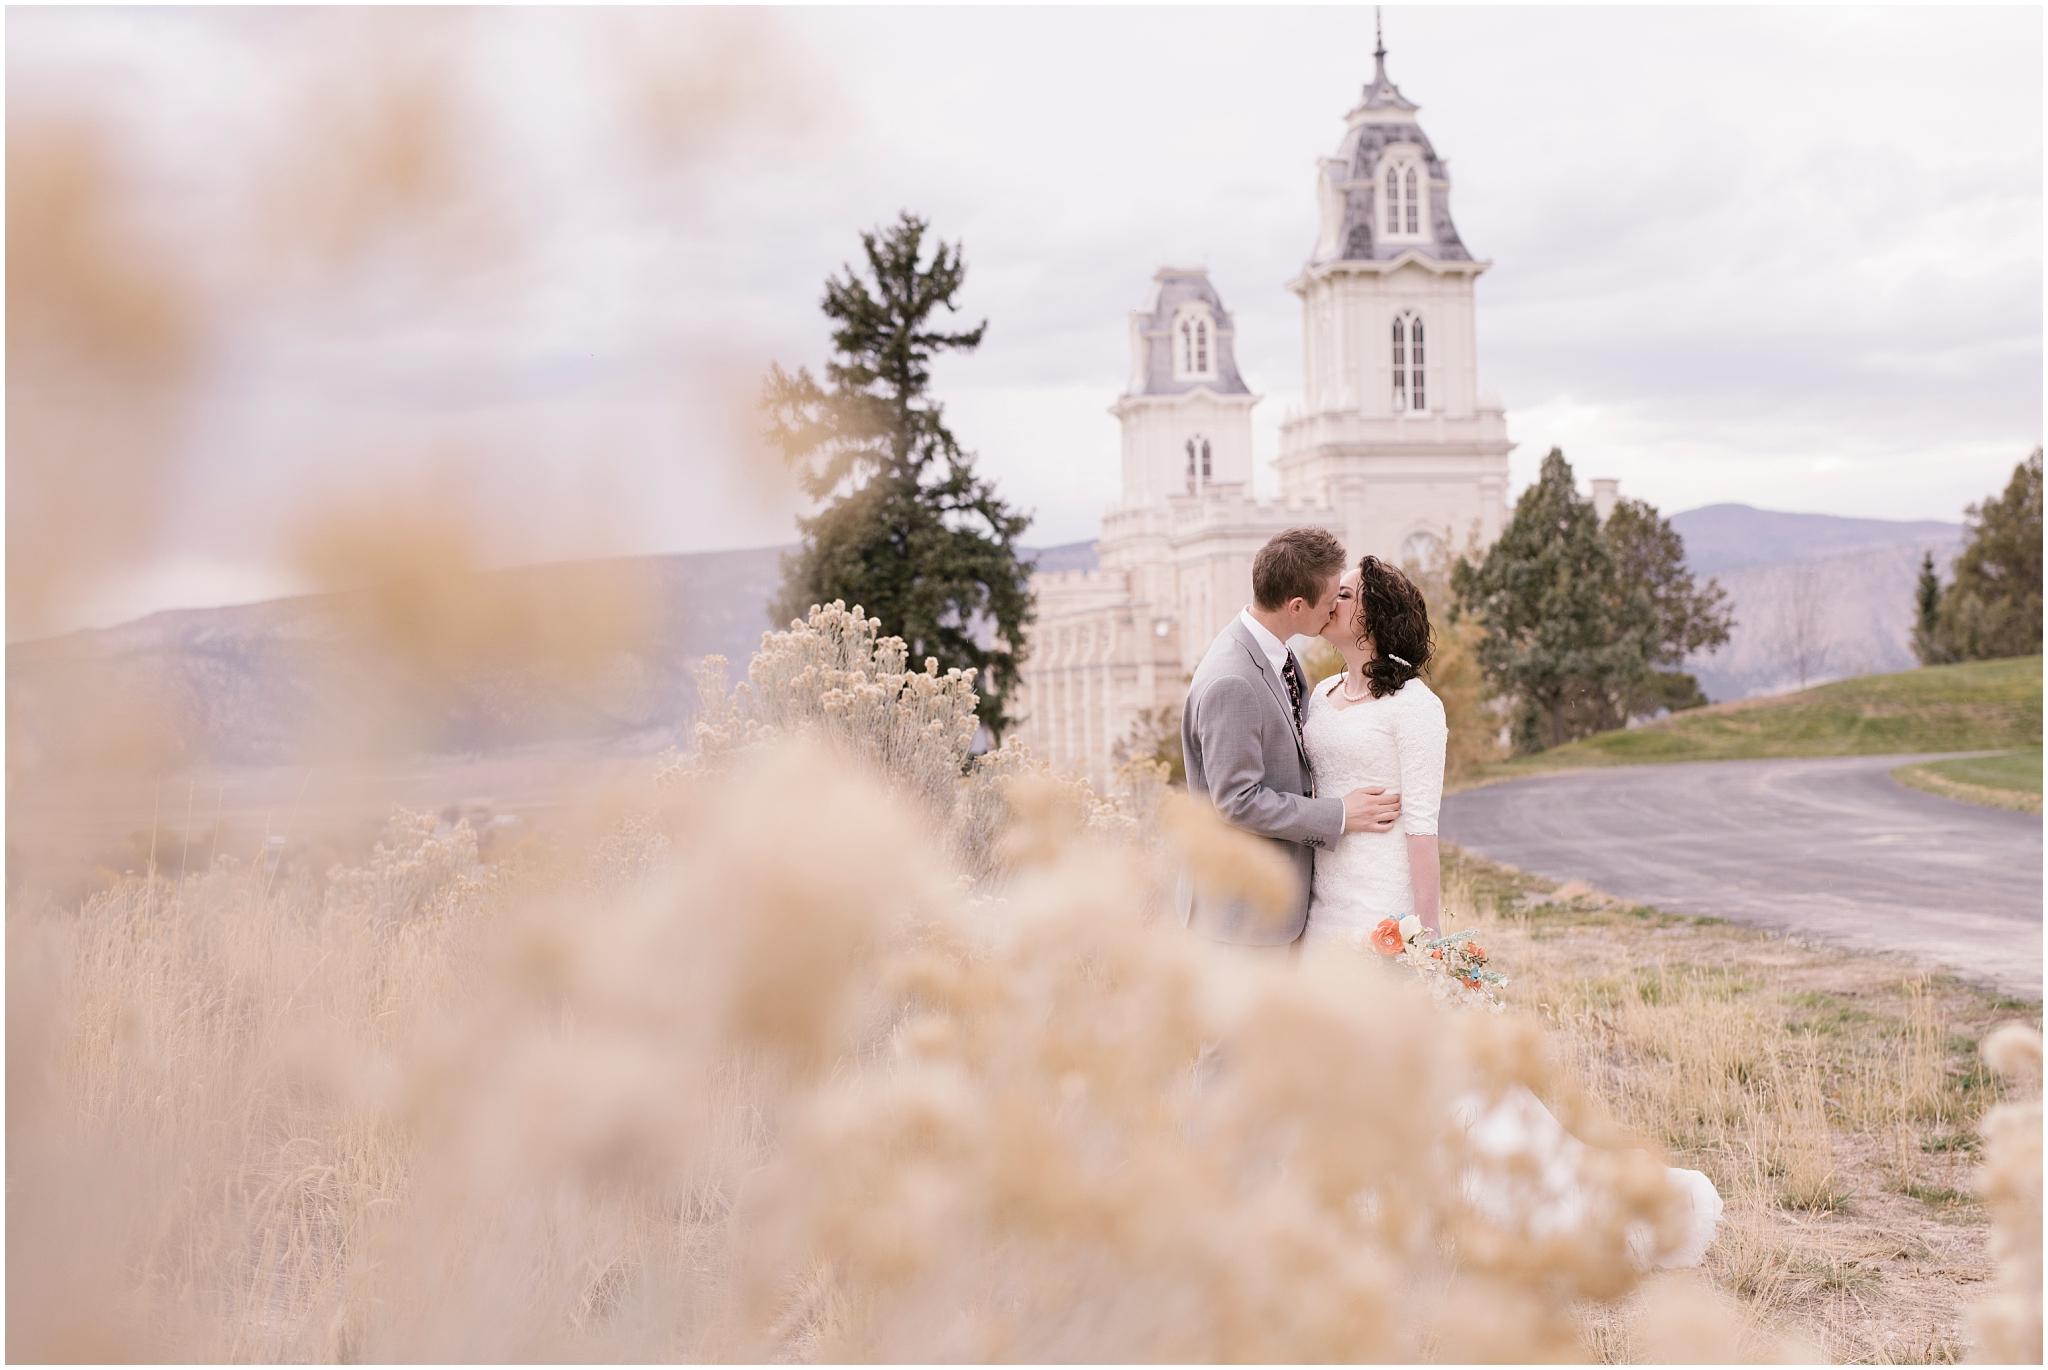 BA-Bridals-58_Lizzie-B-Imagery-Utah-Wedding-Photographer-Central-Utah-Photographer-Utah-County-Manti-Utah-Temple.jpg